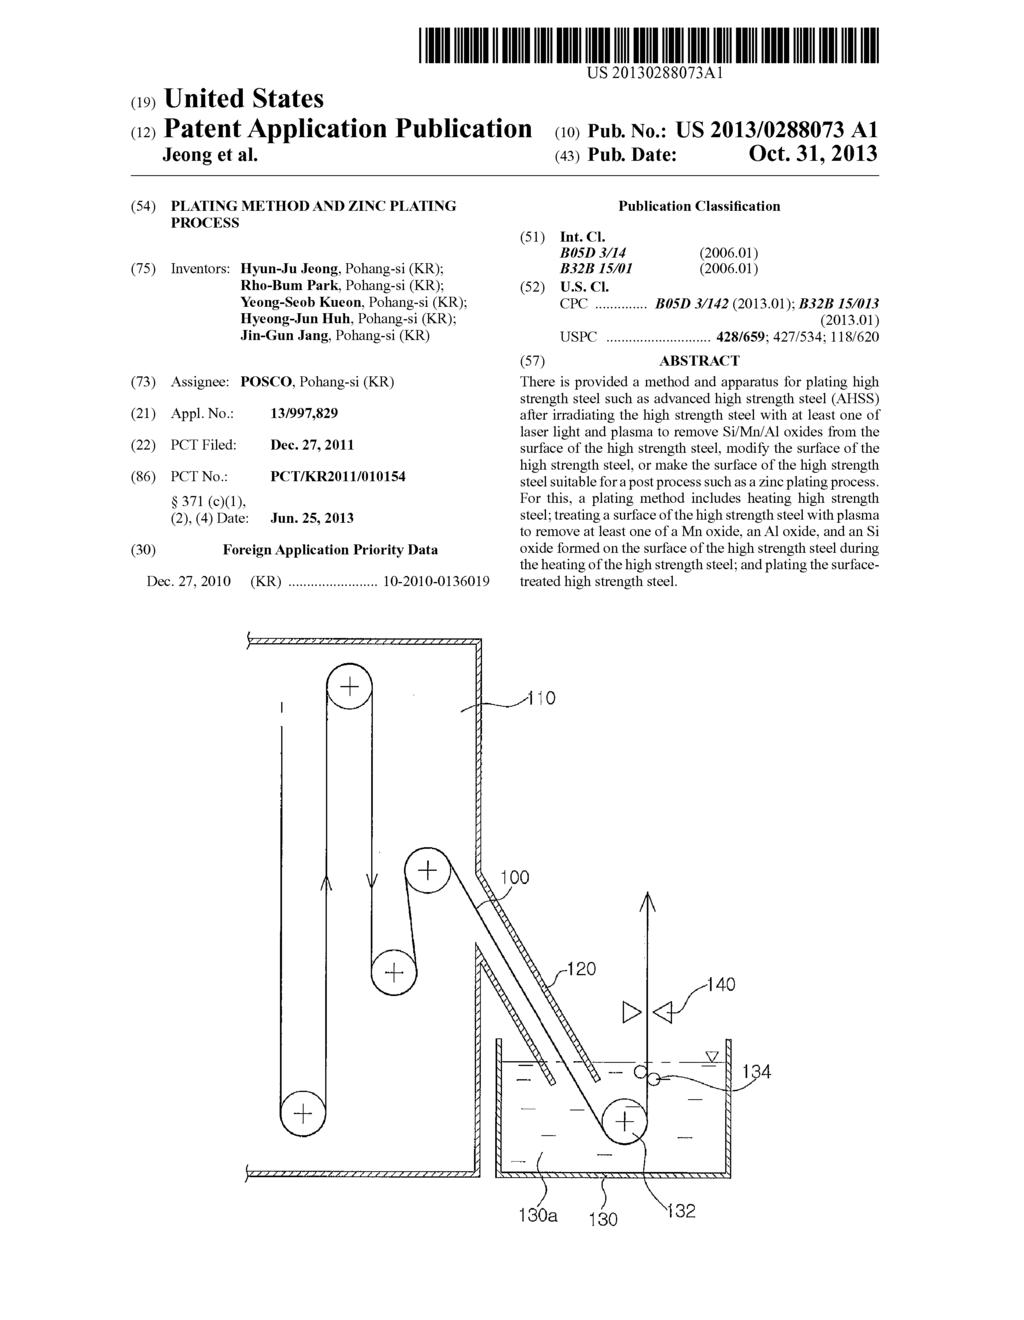 Plating method and zinc plating process diagram schematic and plating method and zinc plating process diagram schematic and image 01 ccuart Choice Image